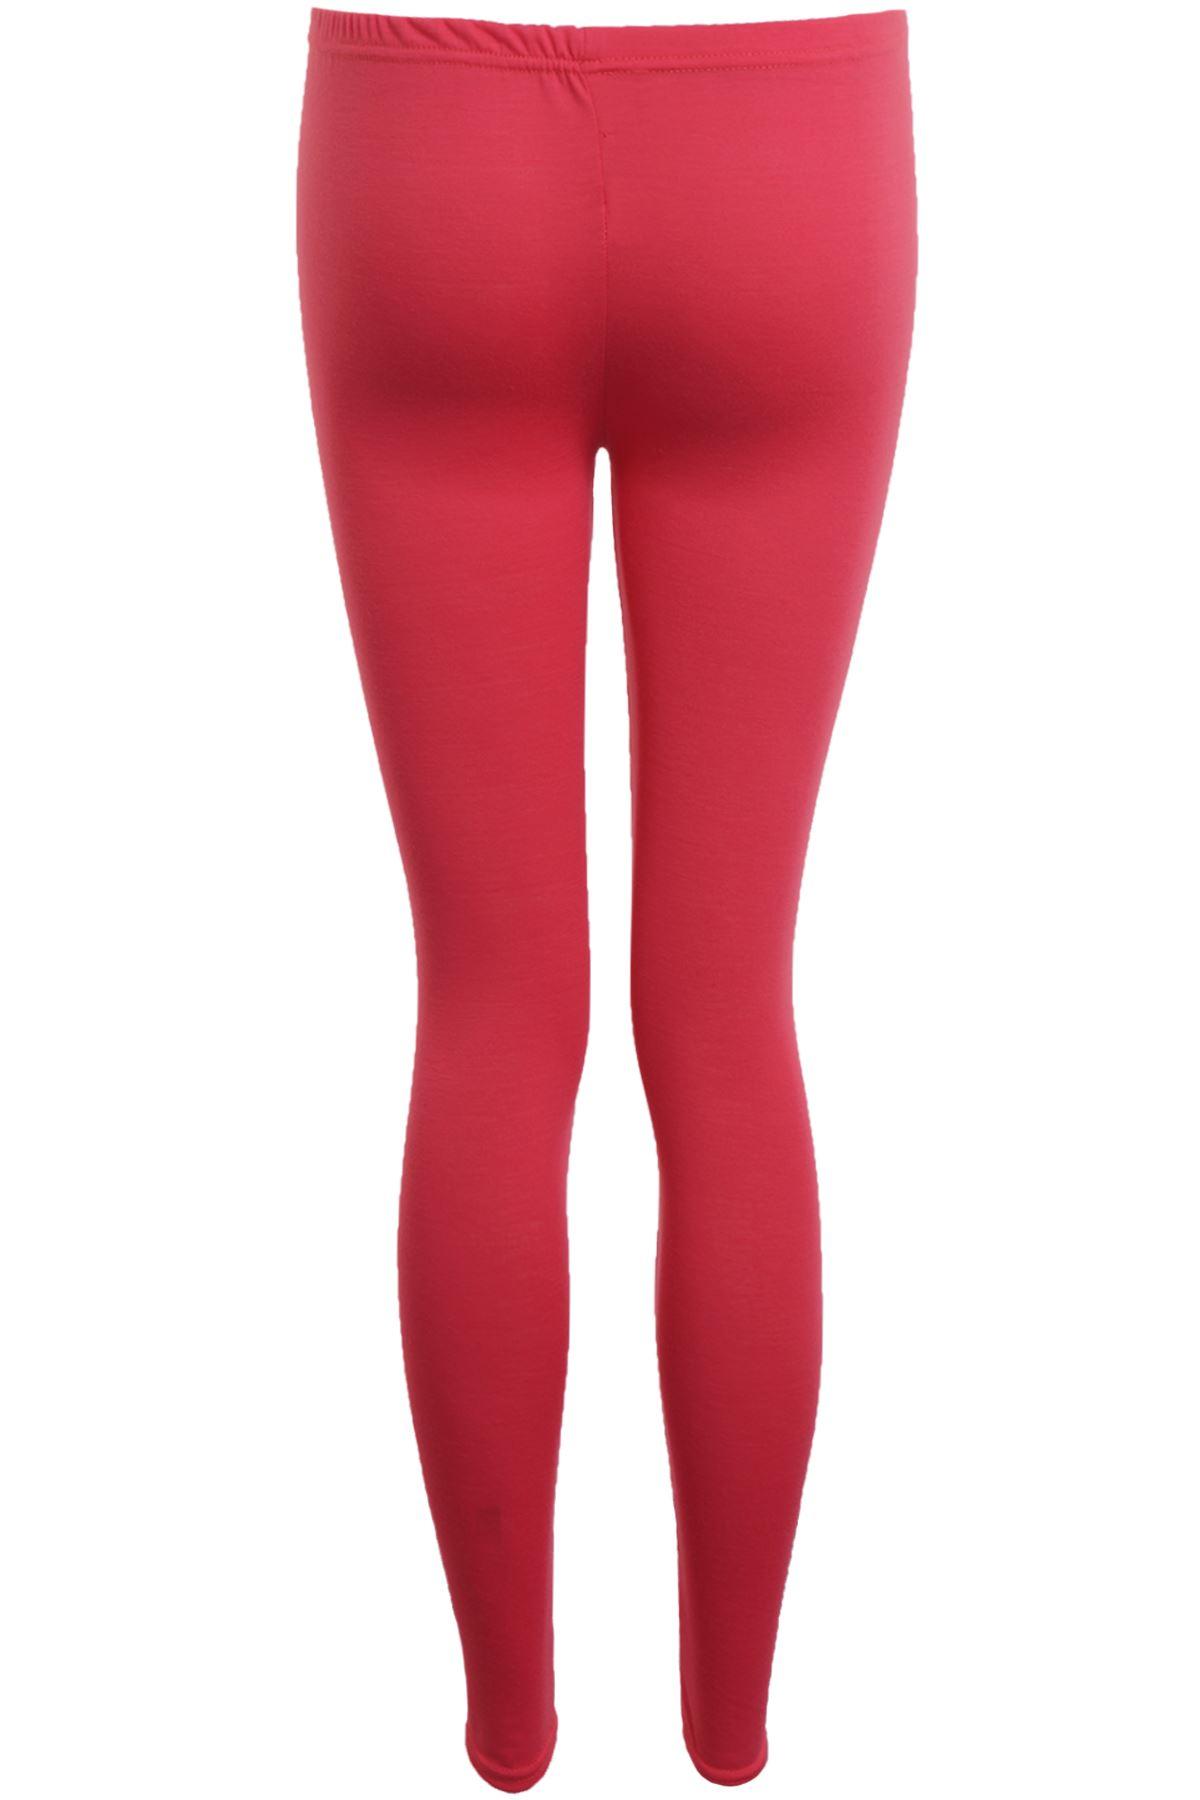 Womens Block Colour Plain Fuchsia Coral Casual Stretch Party Leggings